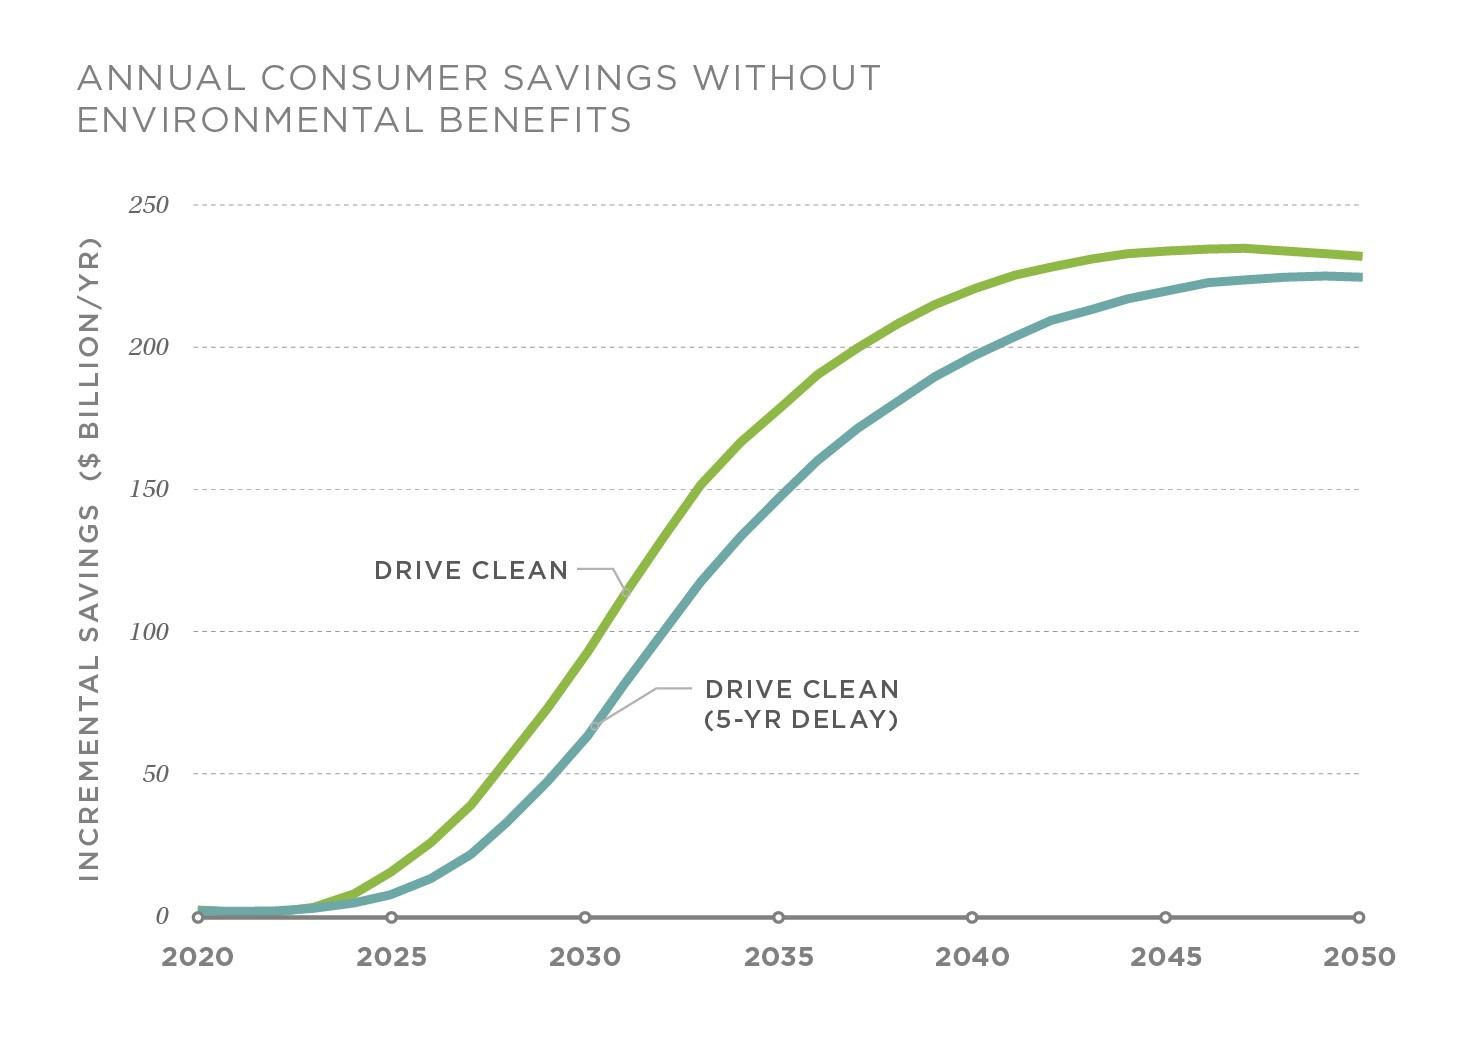 Annual consumer savings in the DRIVE Clean scenario (cumulative savings of $2.7 trillion through 2050) and a delayed-electrification scenario (cumulative savings of $2.2 trillion through 2050).